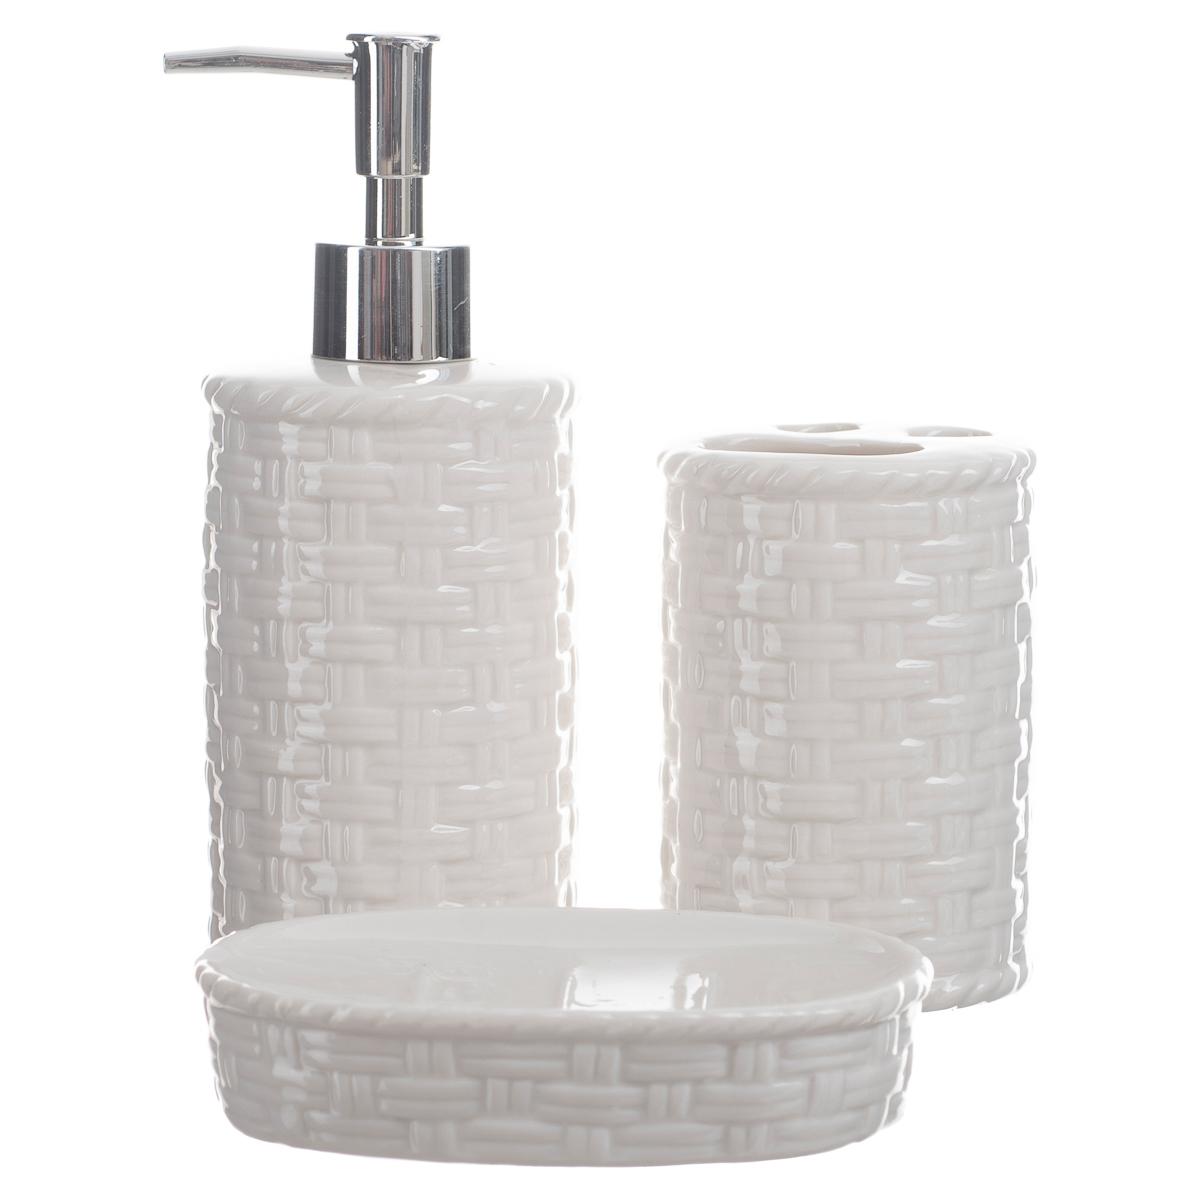 Kit Banheiro Lavabo Conjunto Porta Sabonete Líquido Trançado / KB-030